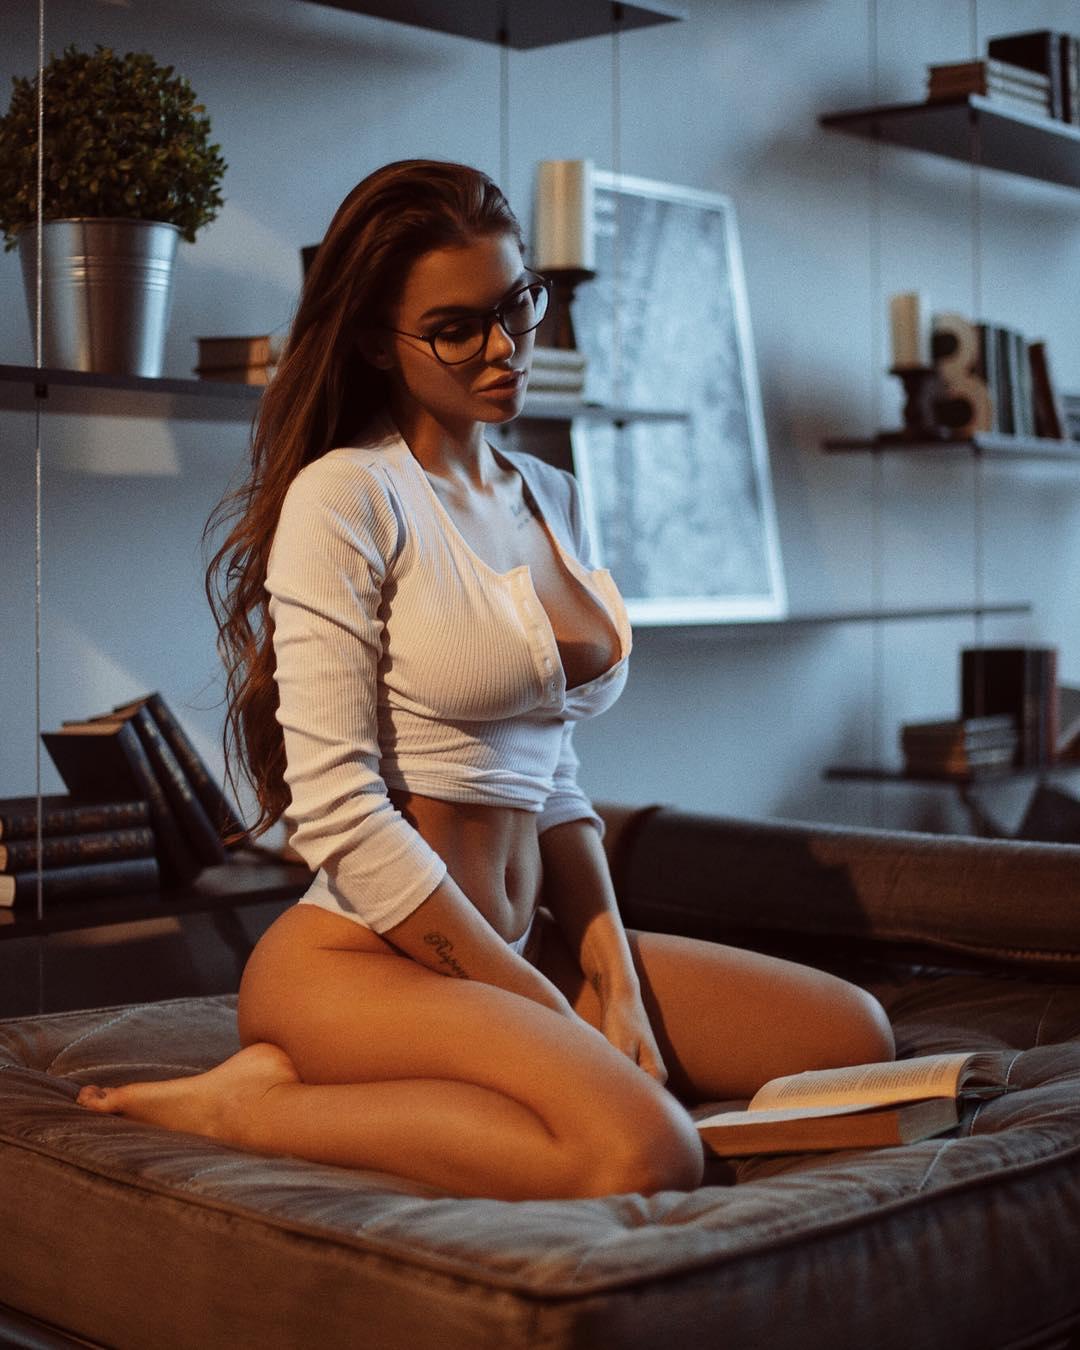 Odintcova porn viki Viktoria Odintcova